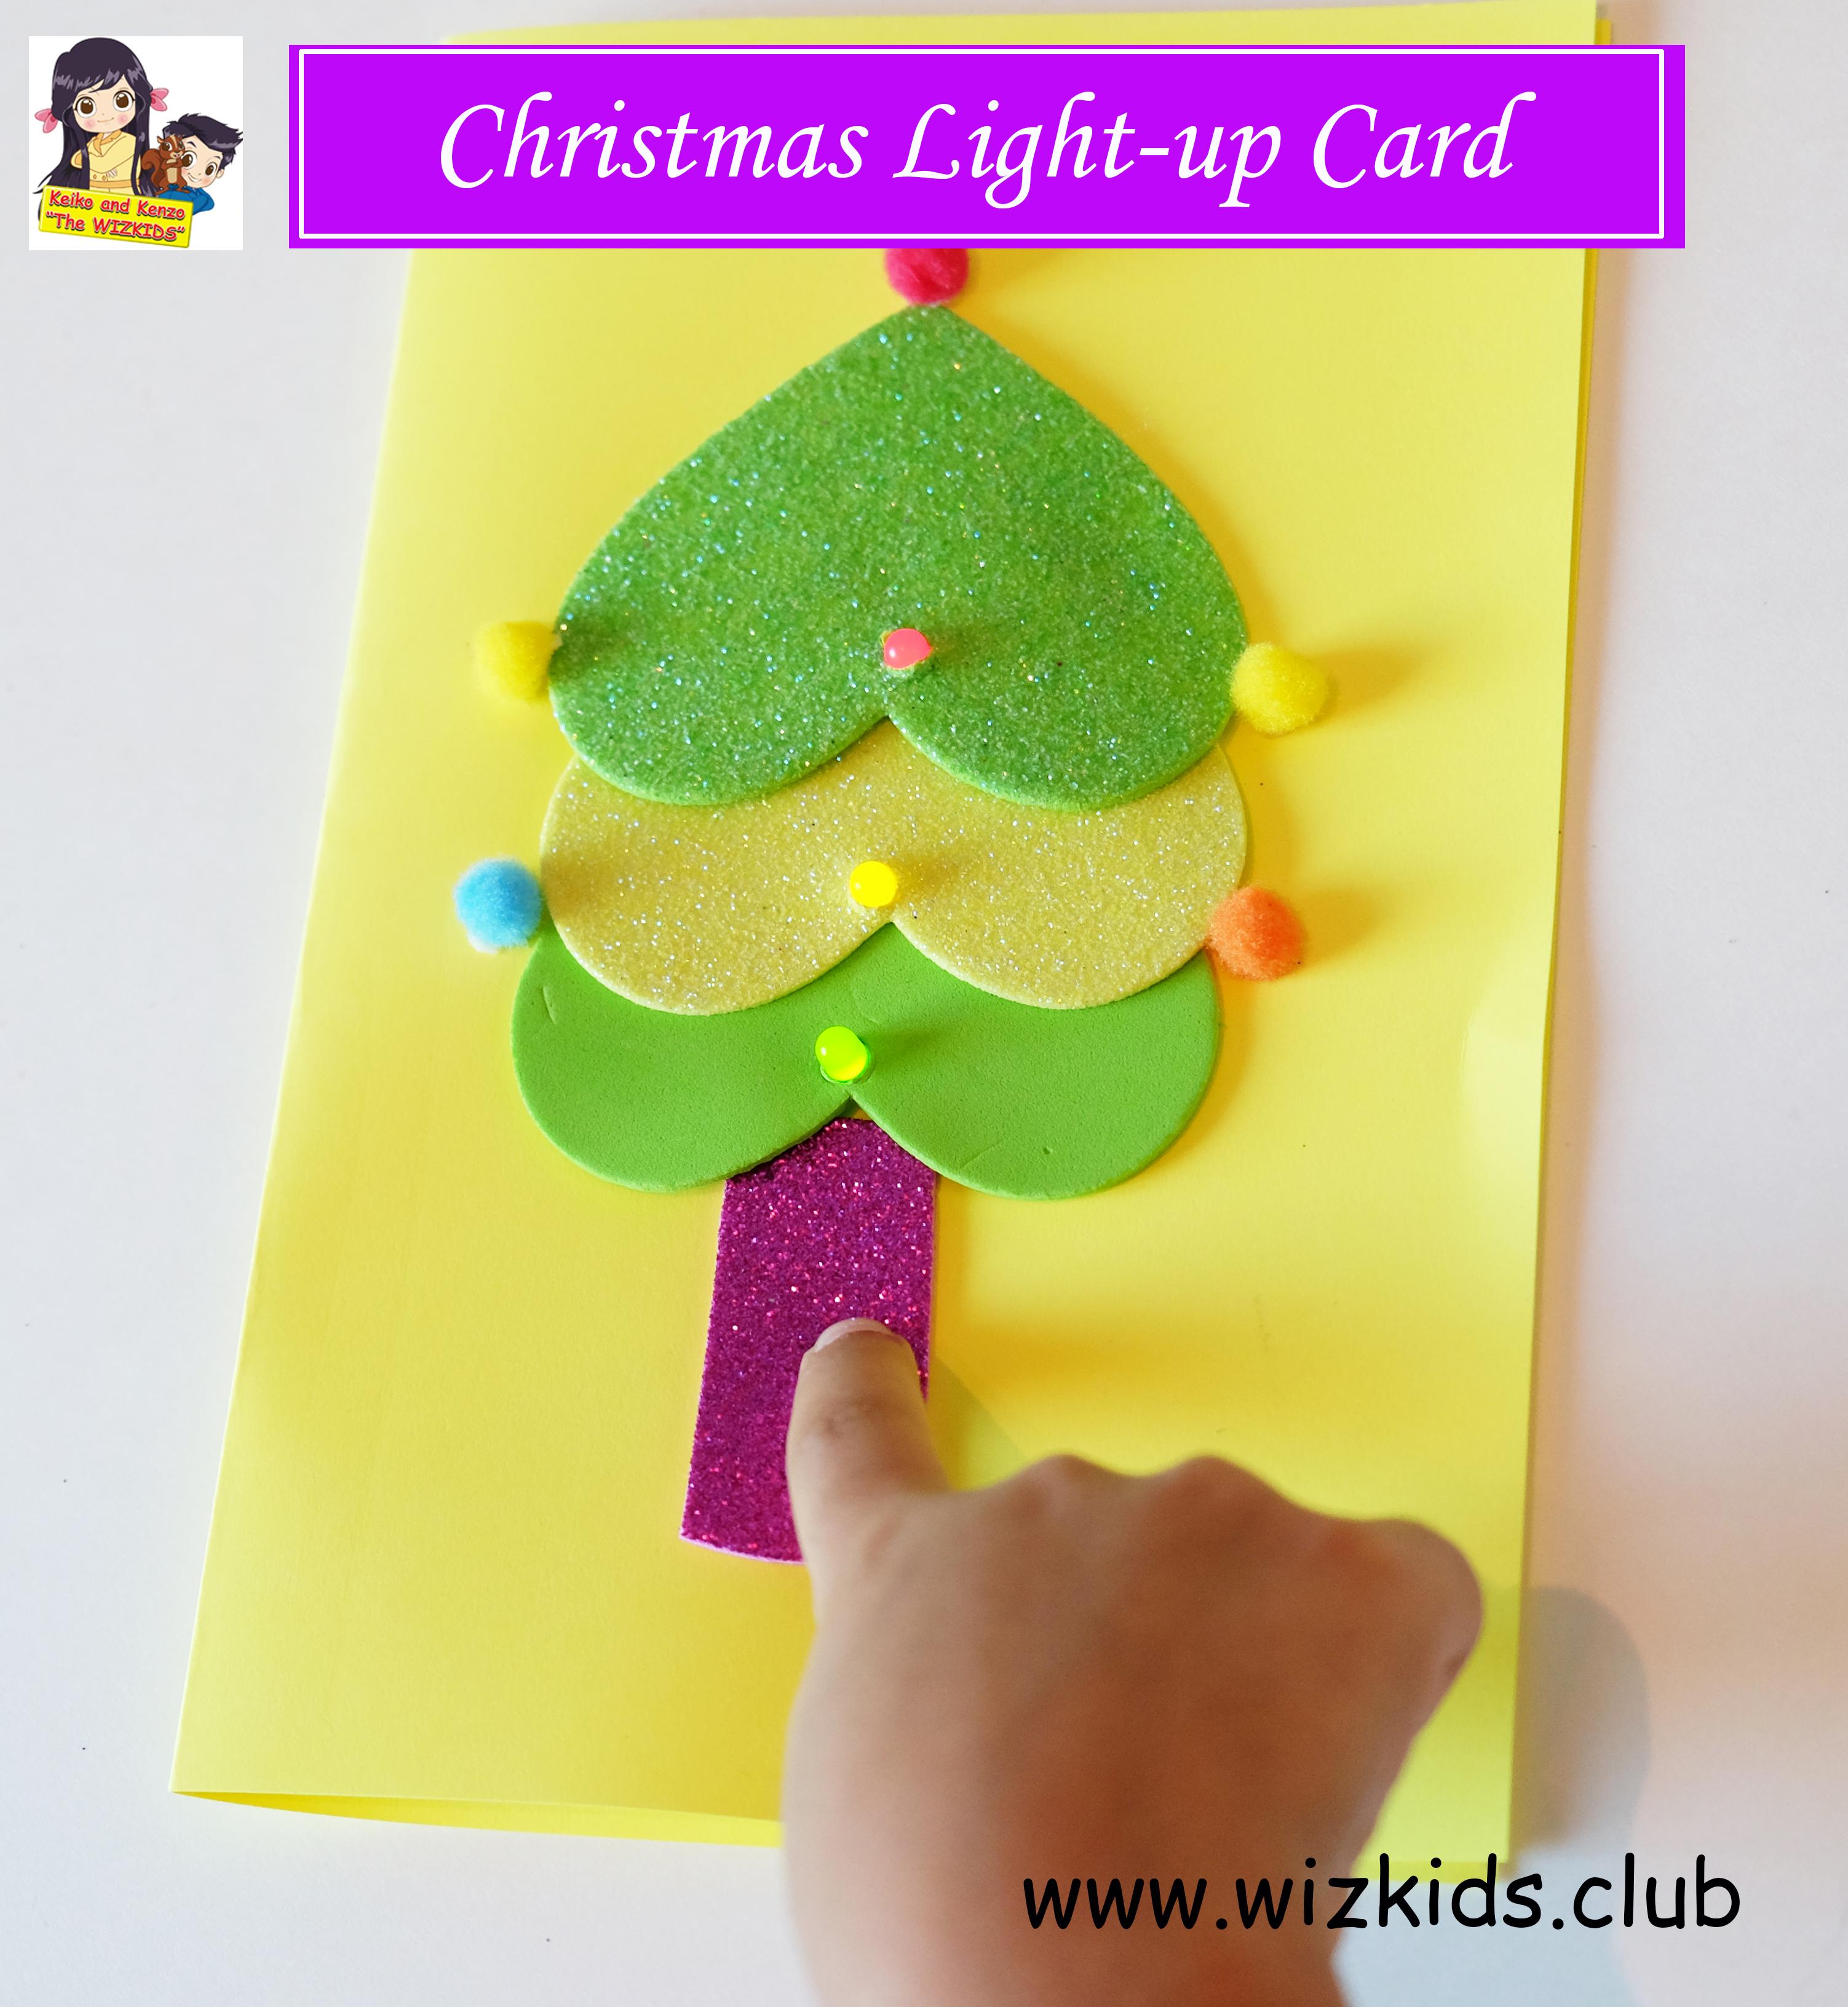 CHRISTMAS LIGHT-UP CARD! DIY FOR KIDS